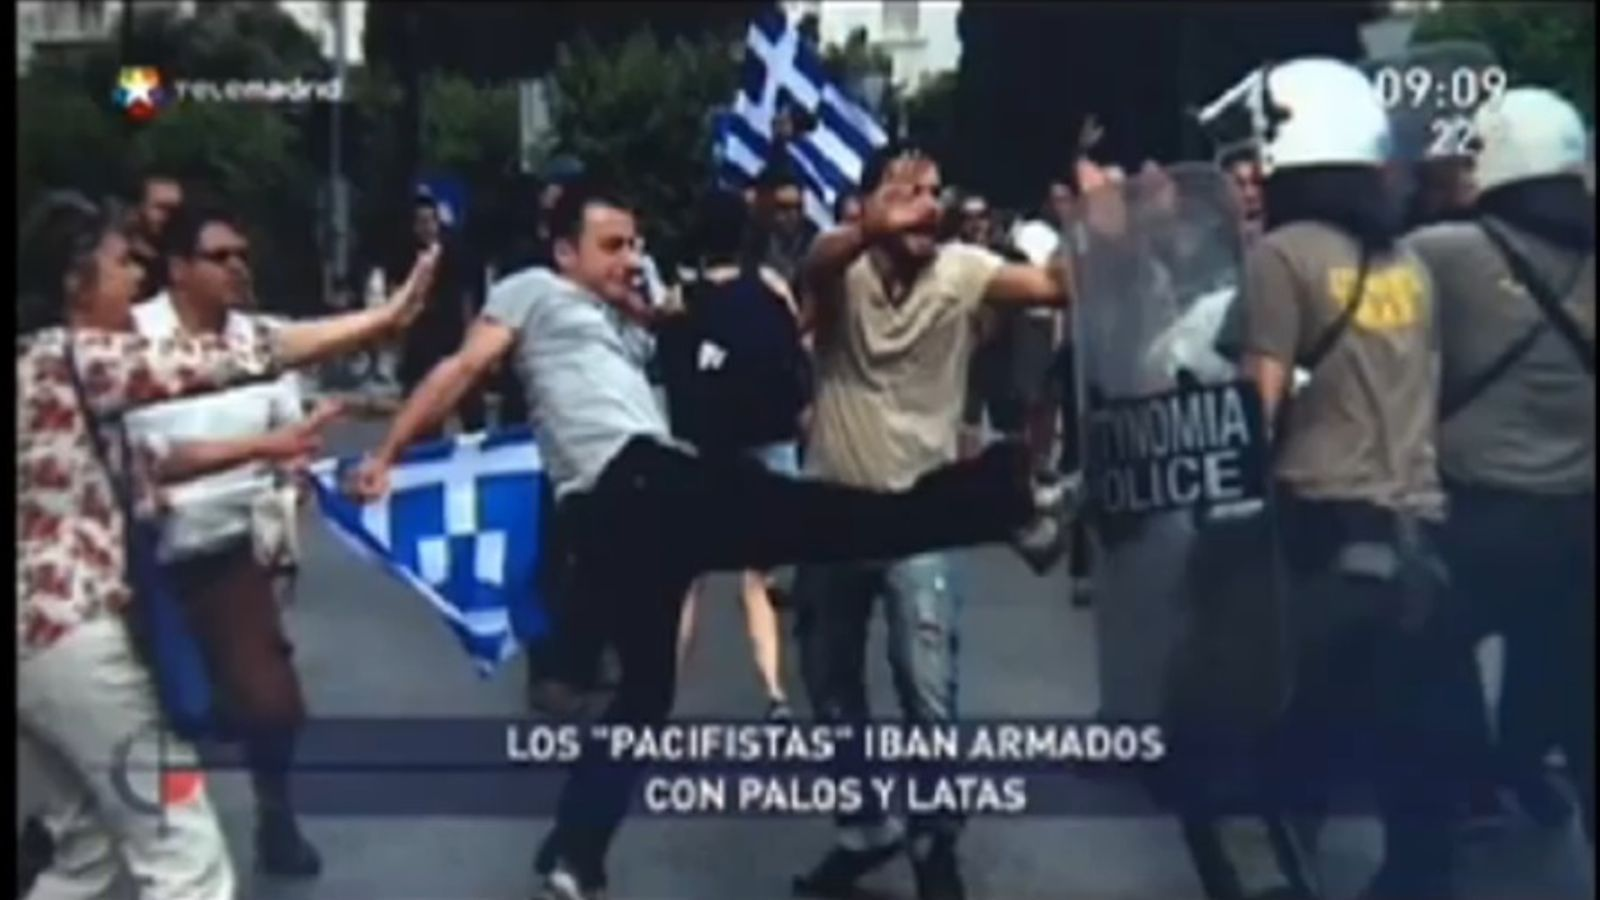 Telemadrid 'confón' manifestants barcelonins amb els grecs